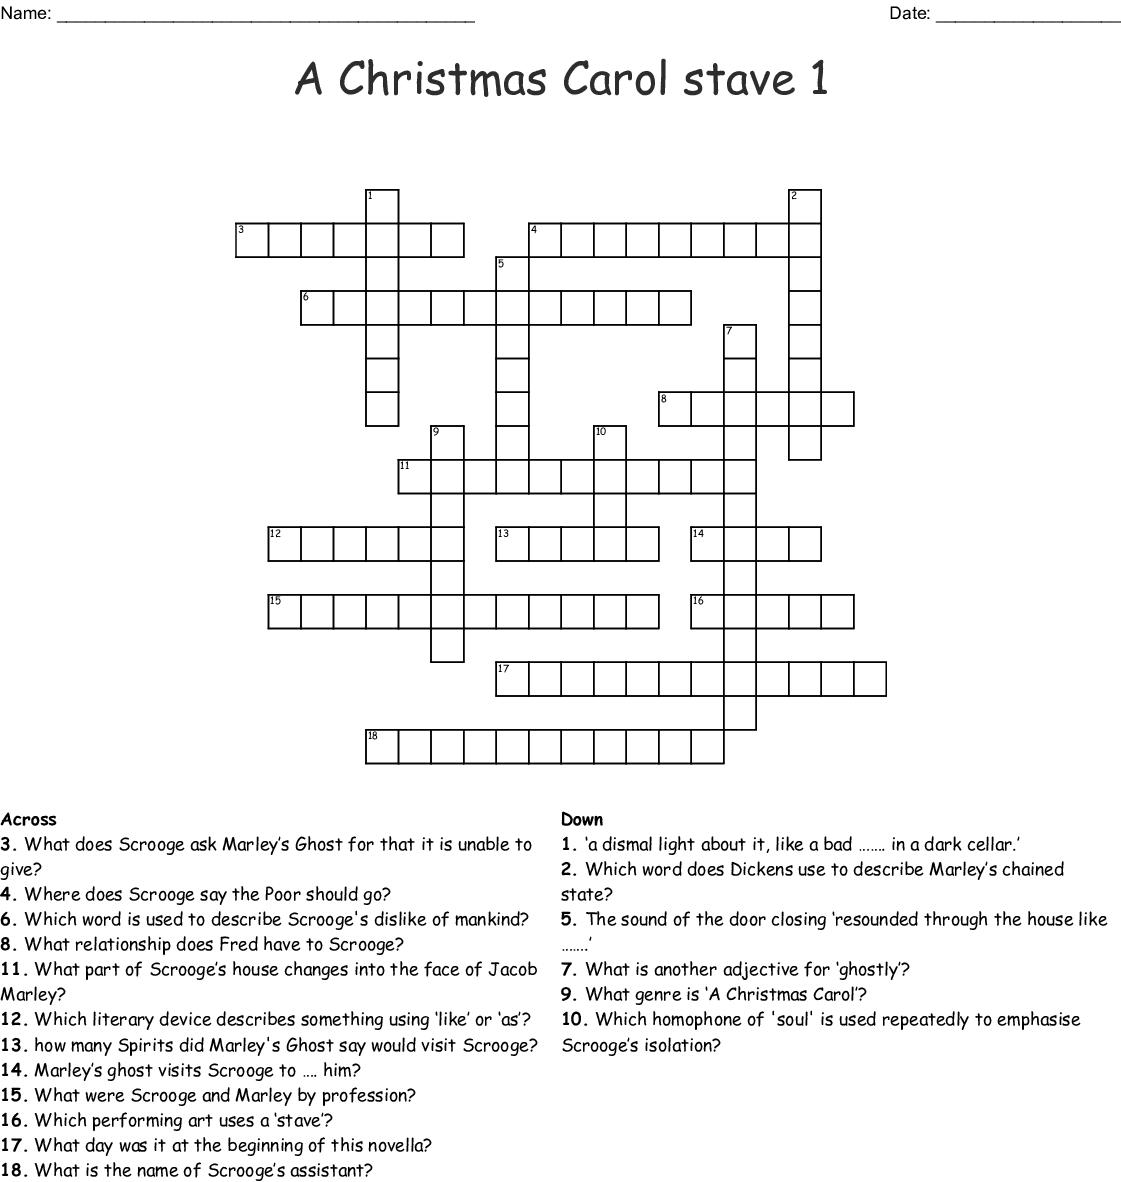 A Christmas Carol Stave 1 Crossword